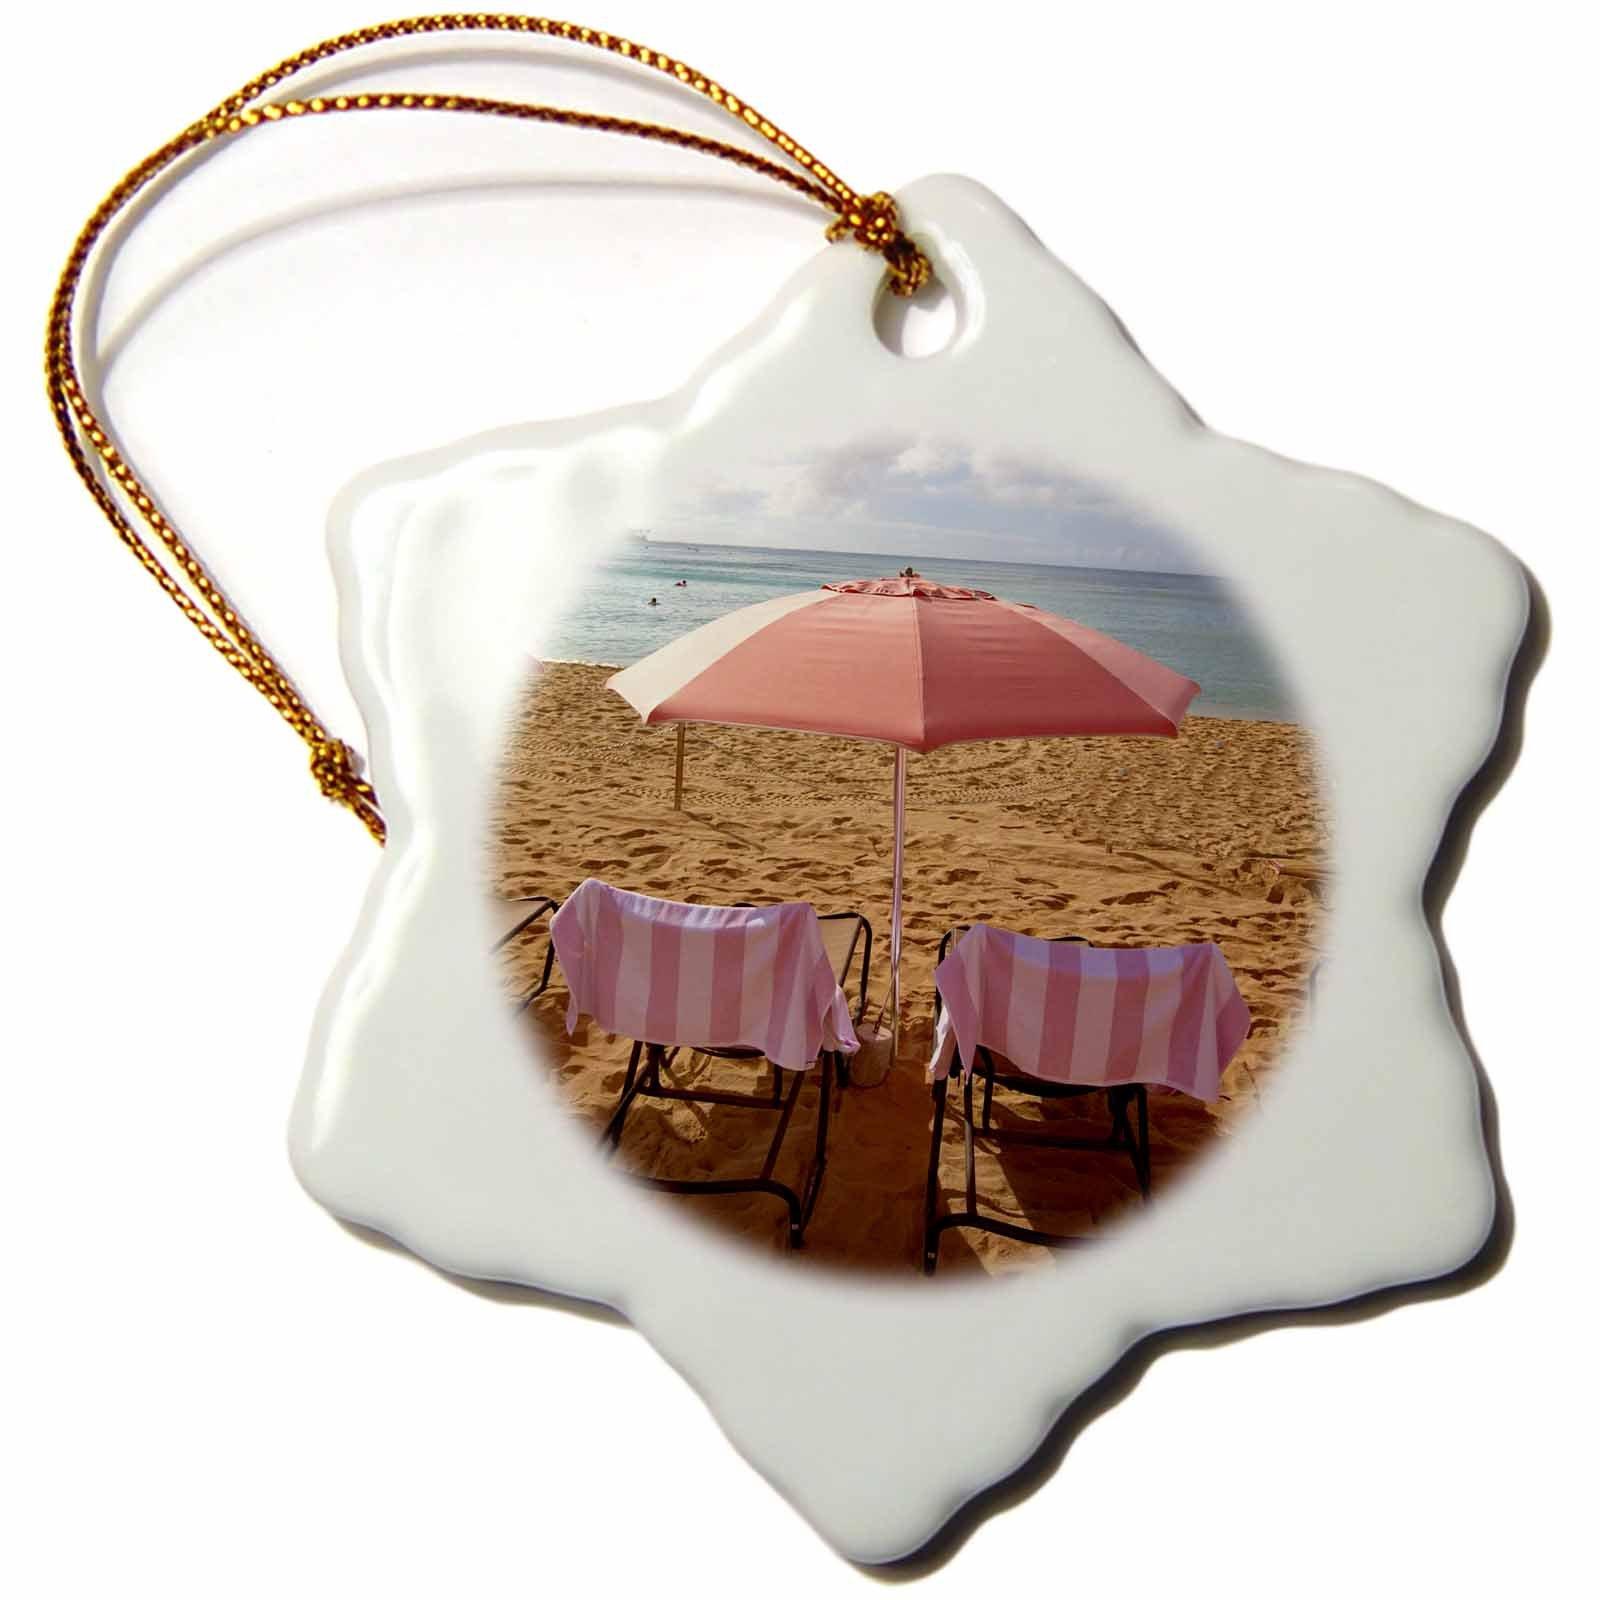 3dRose orn_89773_1 Royal Hawaiian Hotel, Waikiki Beach, Oahu, Hawaii-Us12 Dpb2065-Douglas Peebles-Snowflake Ornament, 3-Inch, Porcelain